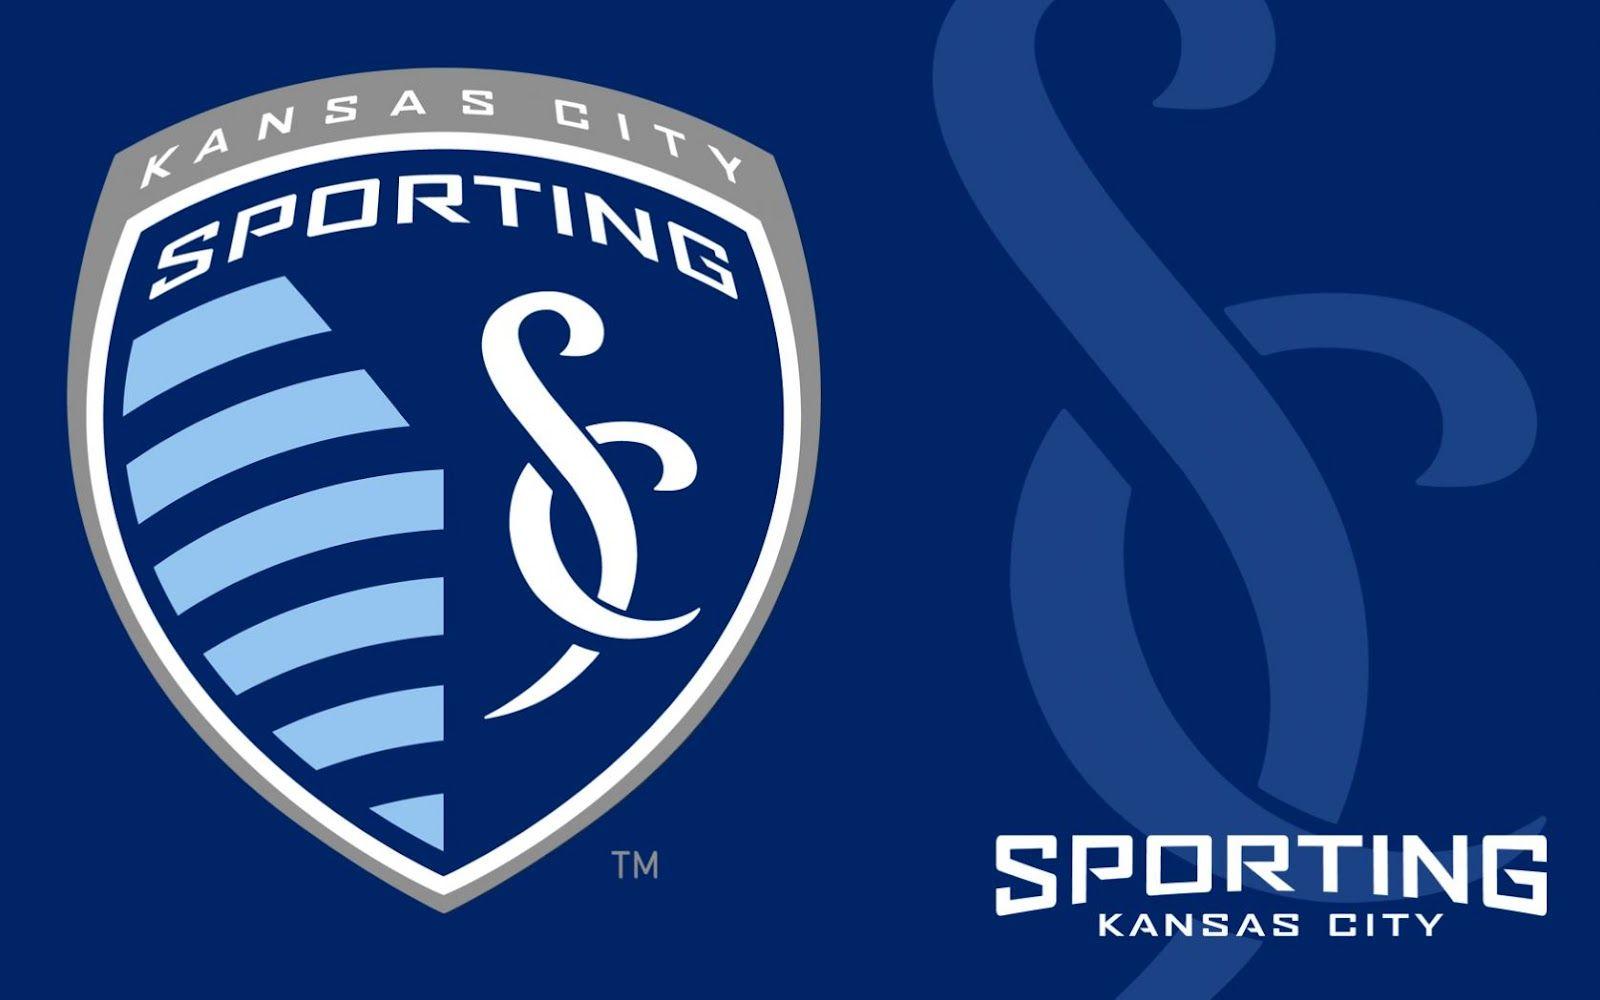 Sporting Kansas City Hd Wallpaper Sporting Kansas City Sporting Kc Kansas City